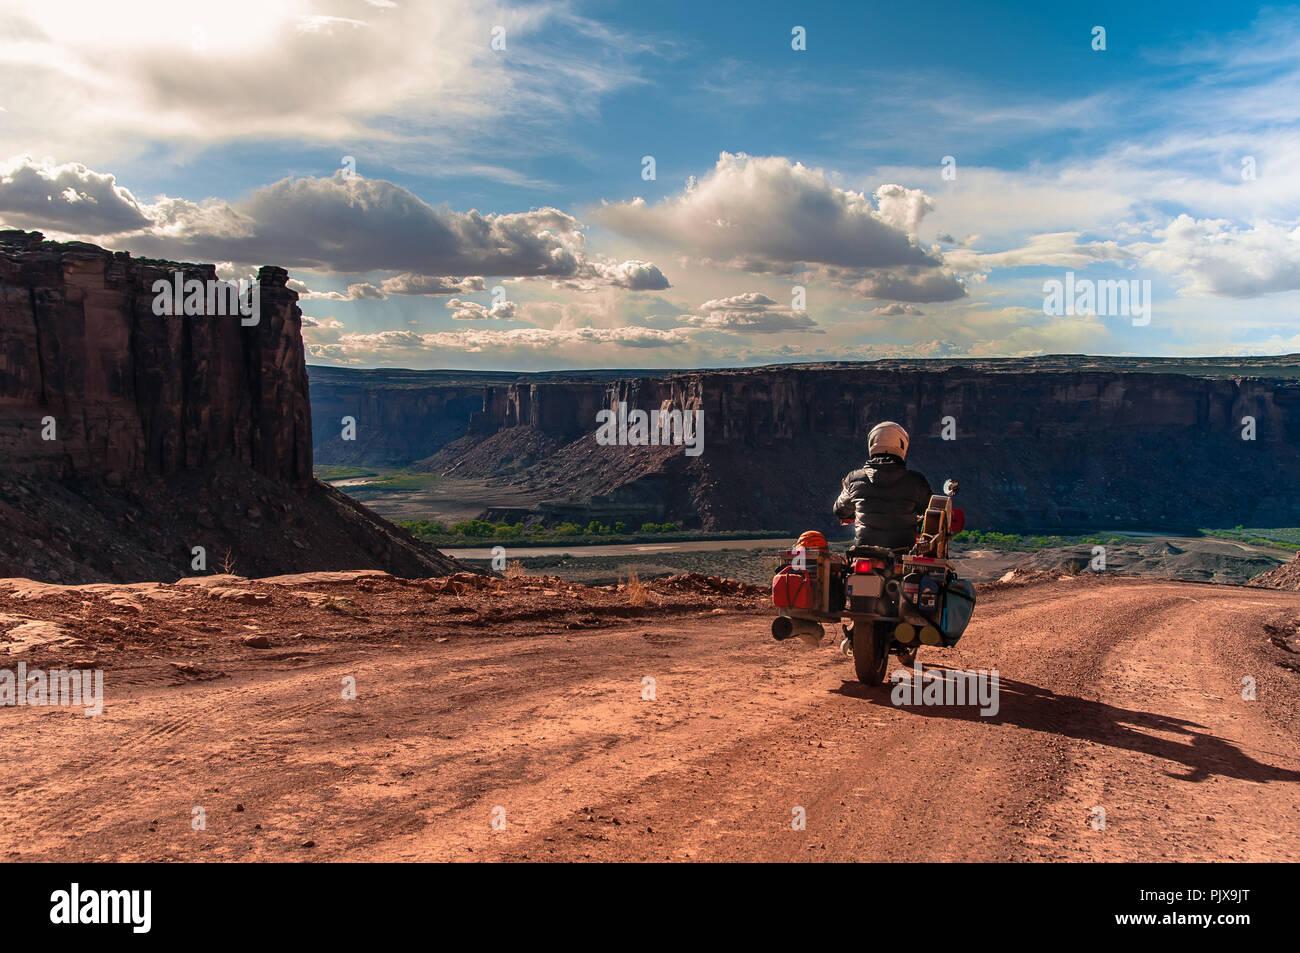 Biker auf Rock climbing Route, Canyonlands National Park, Moab, Utah, USA Stockfoto